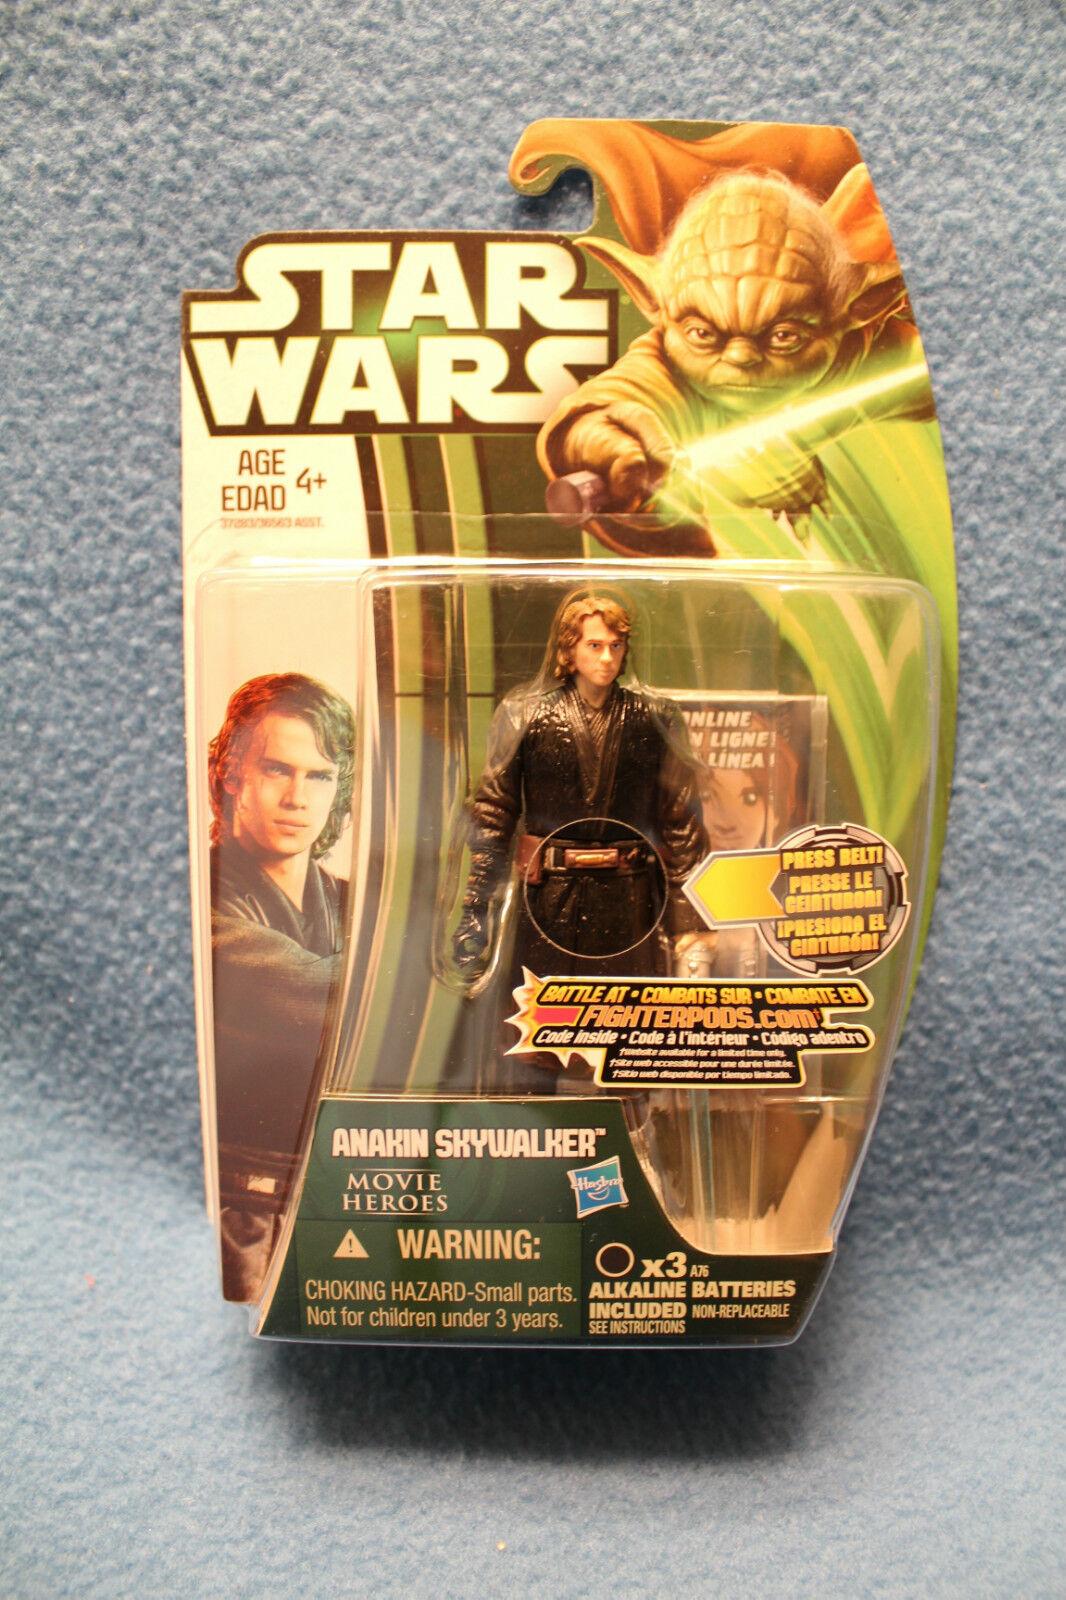 Star Wars Movie Heroes 2013 Wave Wave Wave 1 - MH02  Anakin Skywalker - Canadian Yoda Card 7bf024